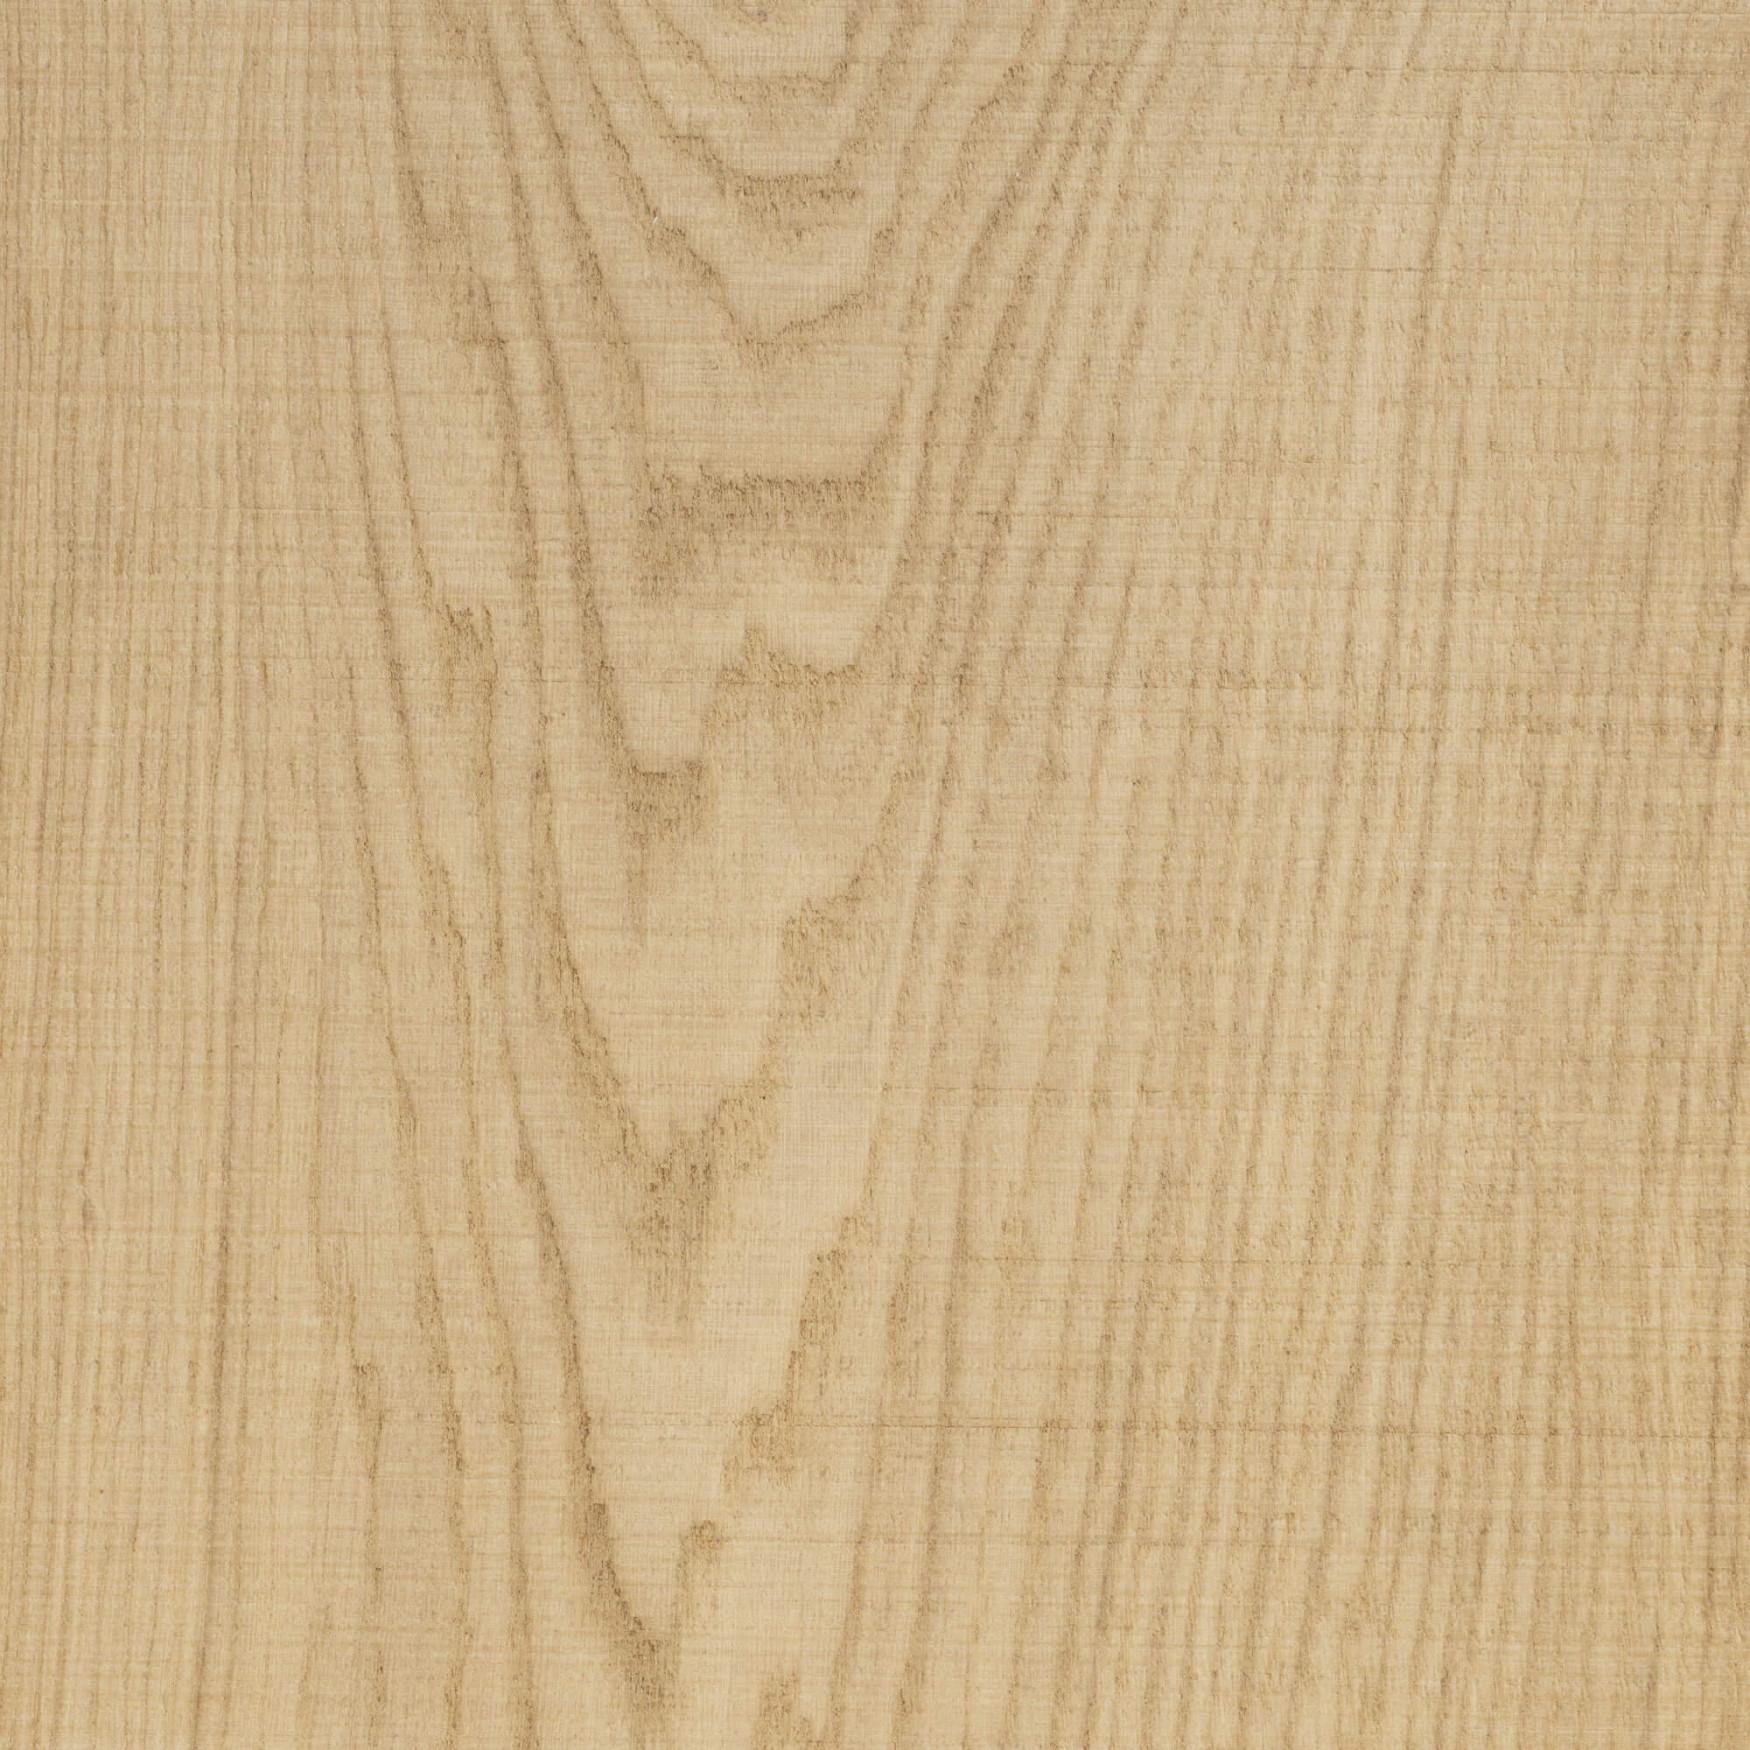 Element7-wide-plank-samples-RT-Raw-Oak